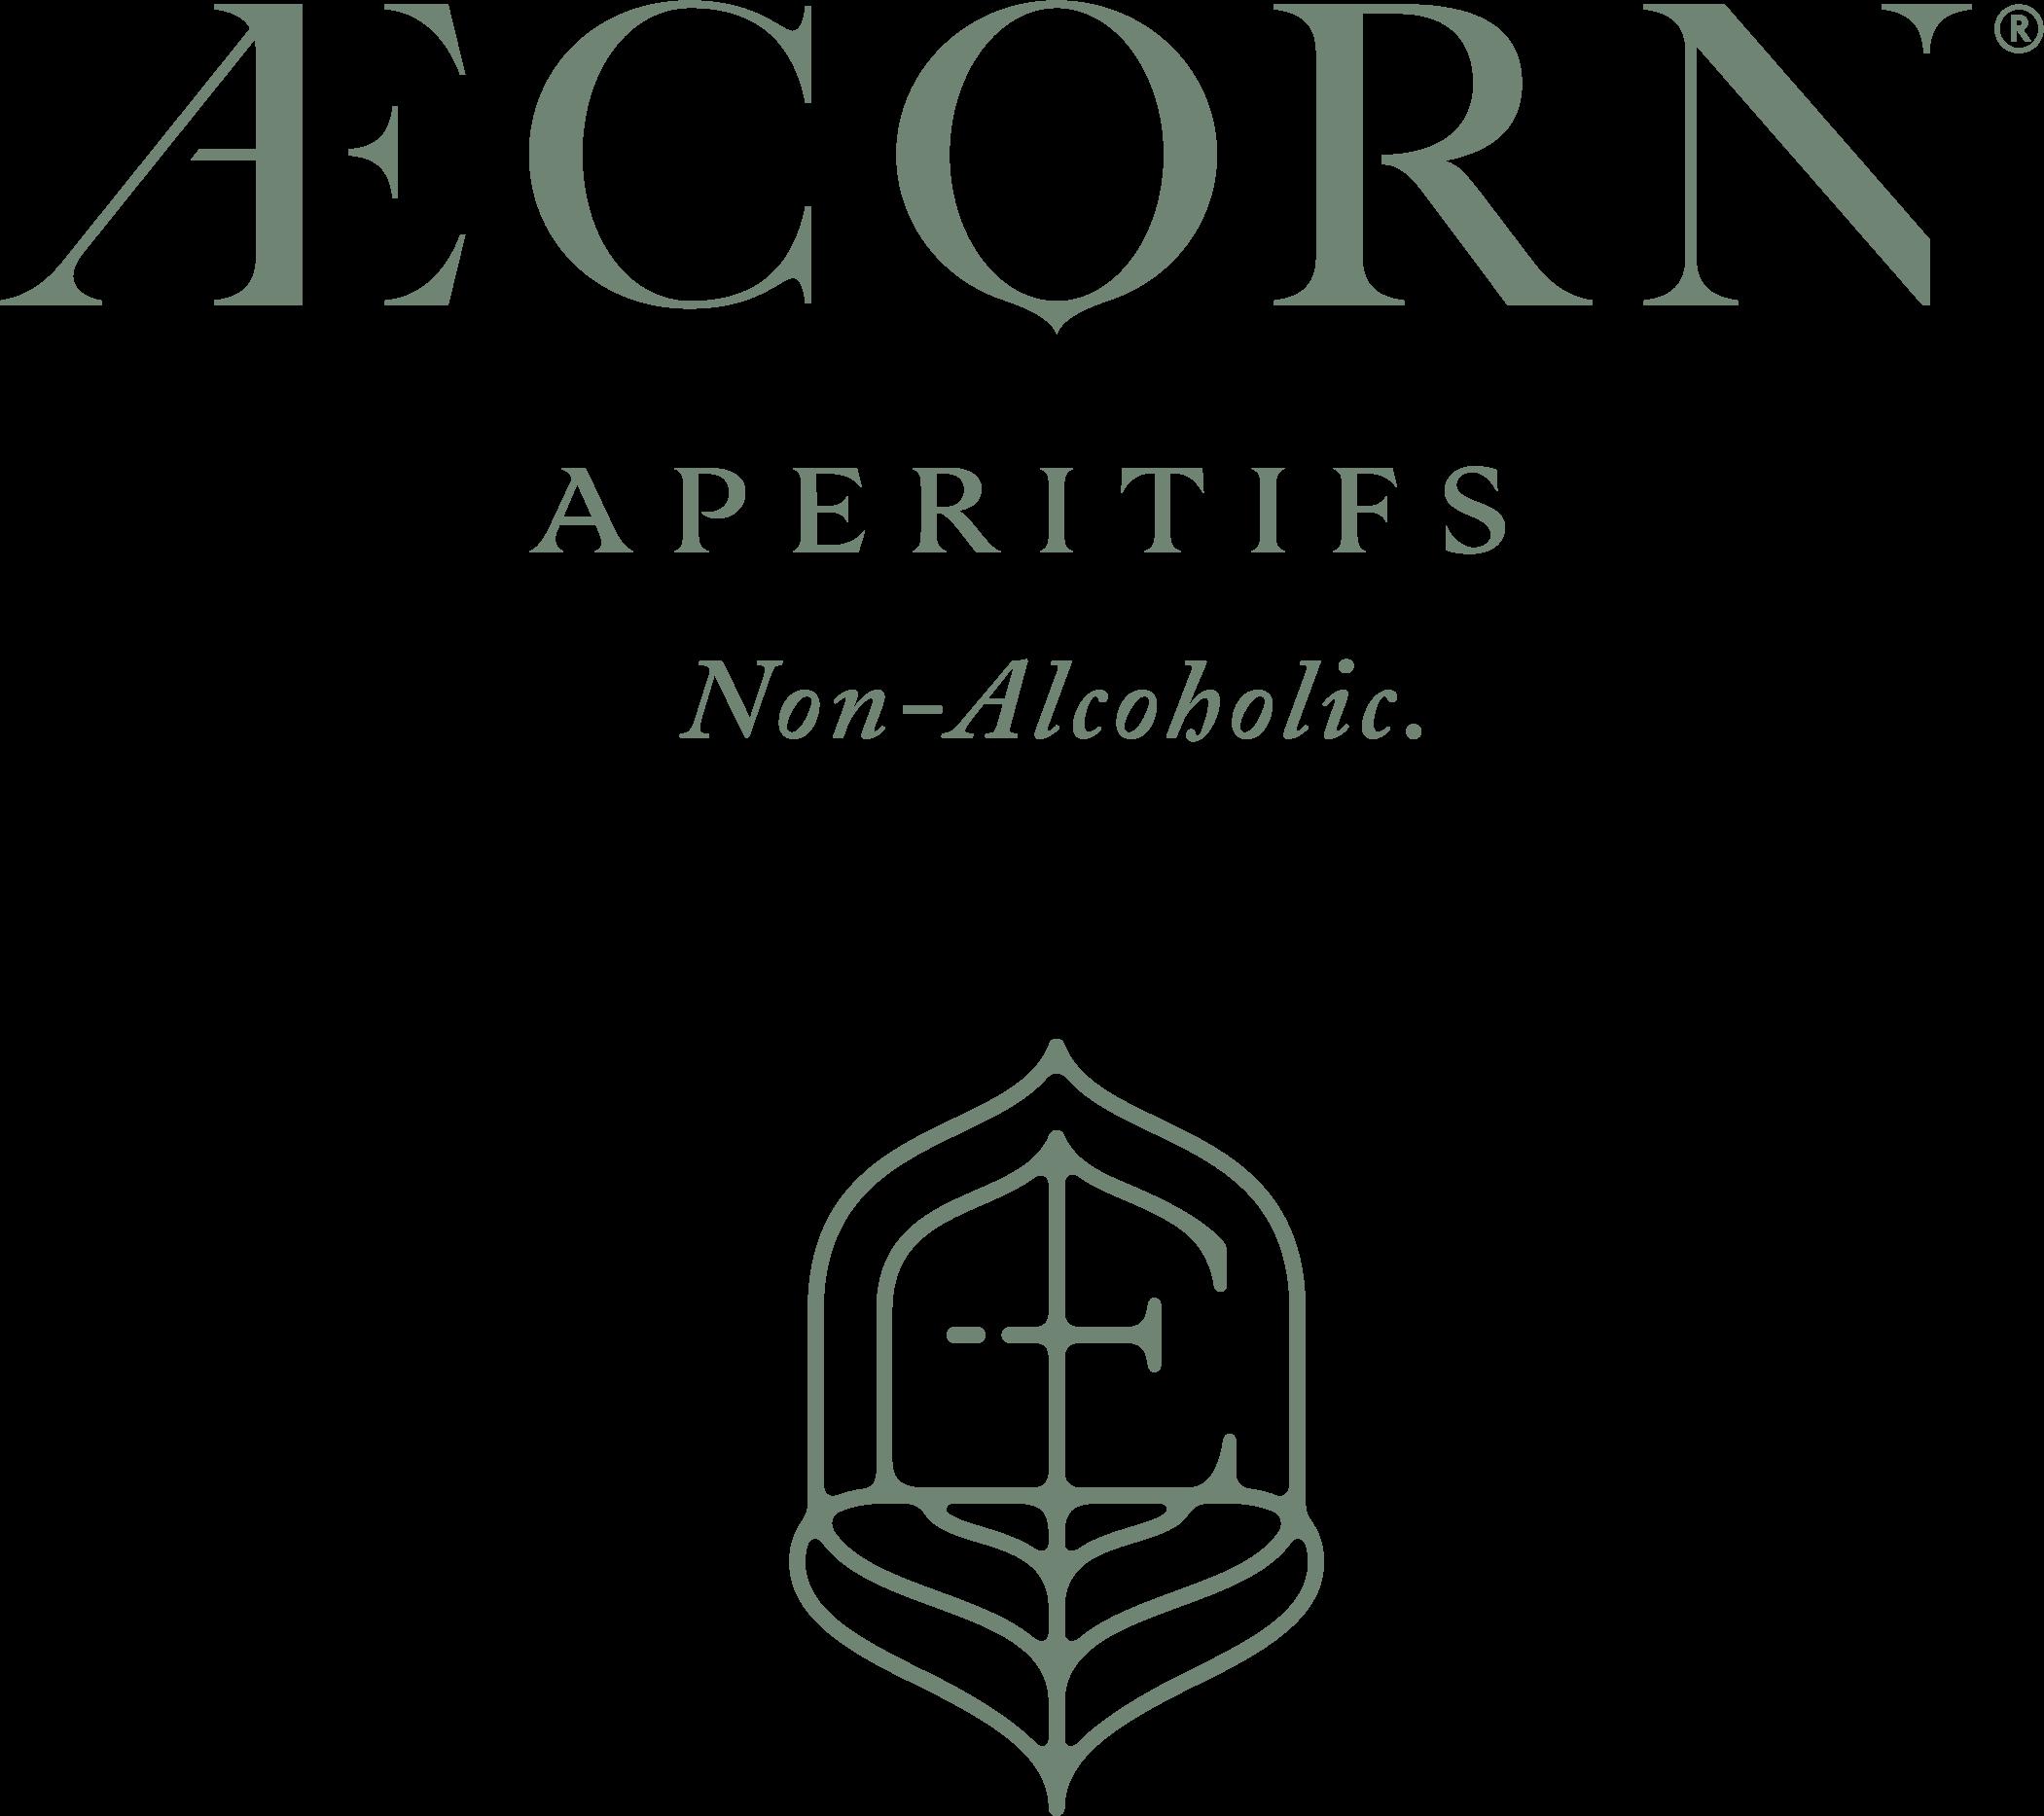 aecorn logo